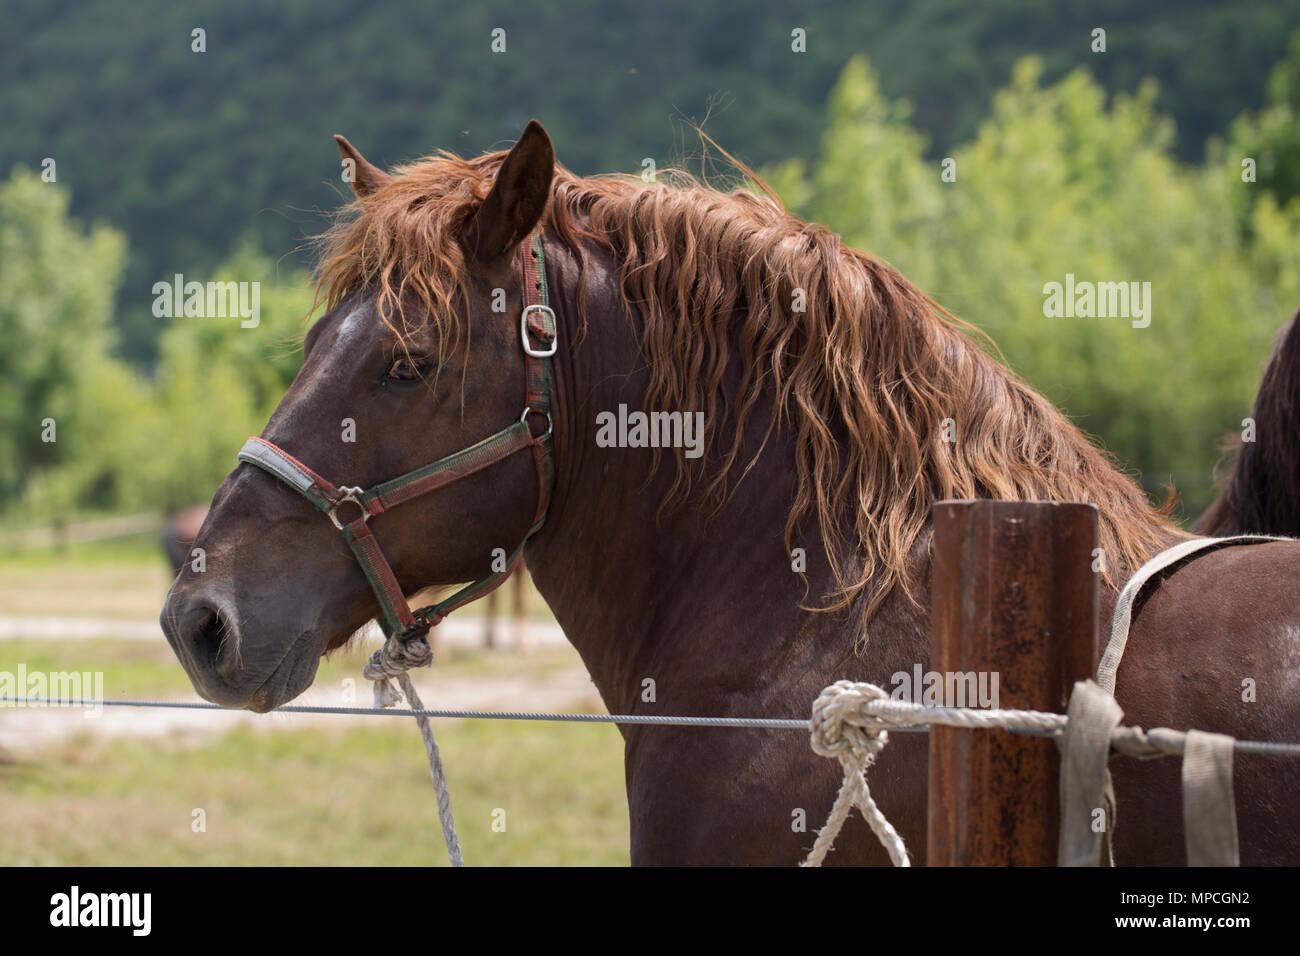 Portrait of a sorrel horse - Stock Image